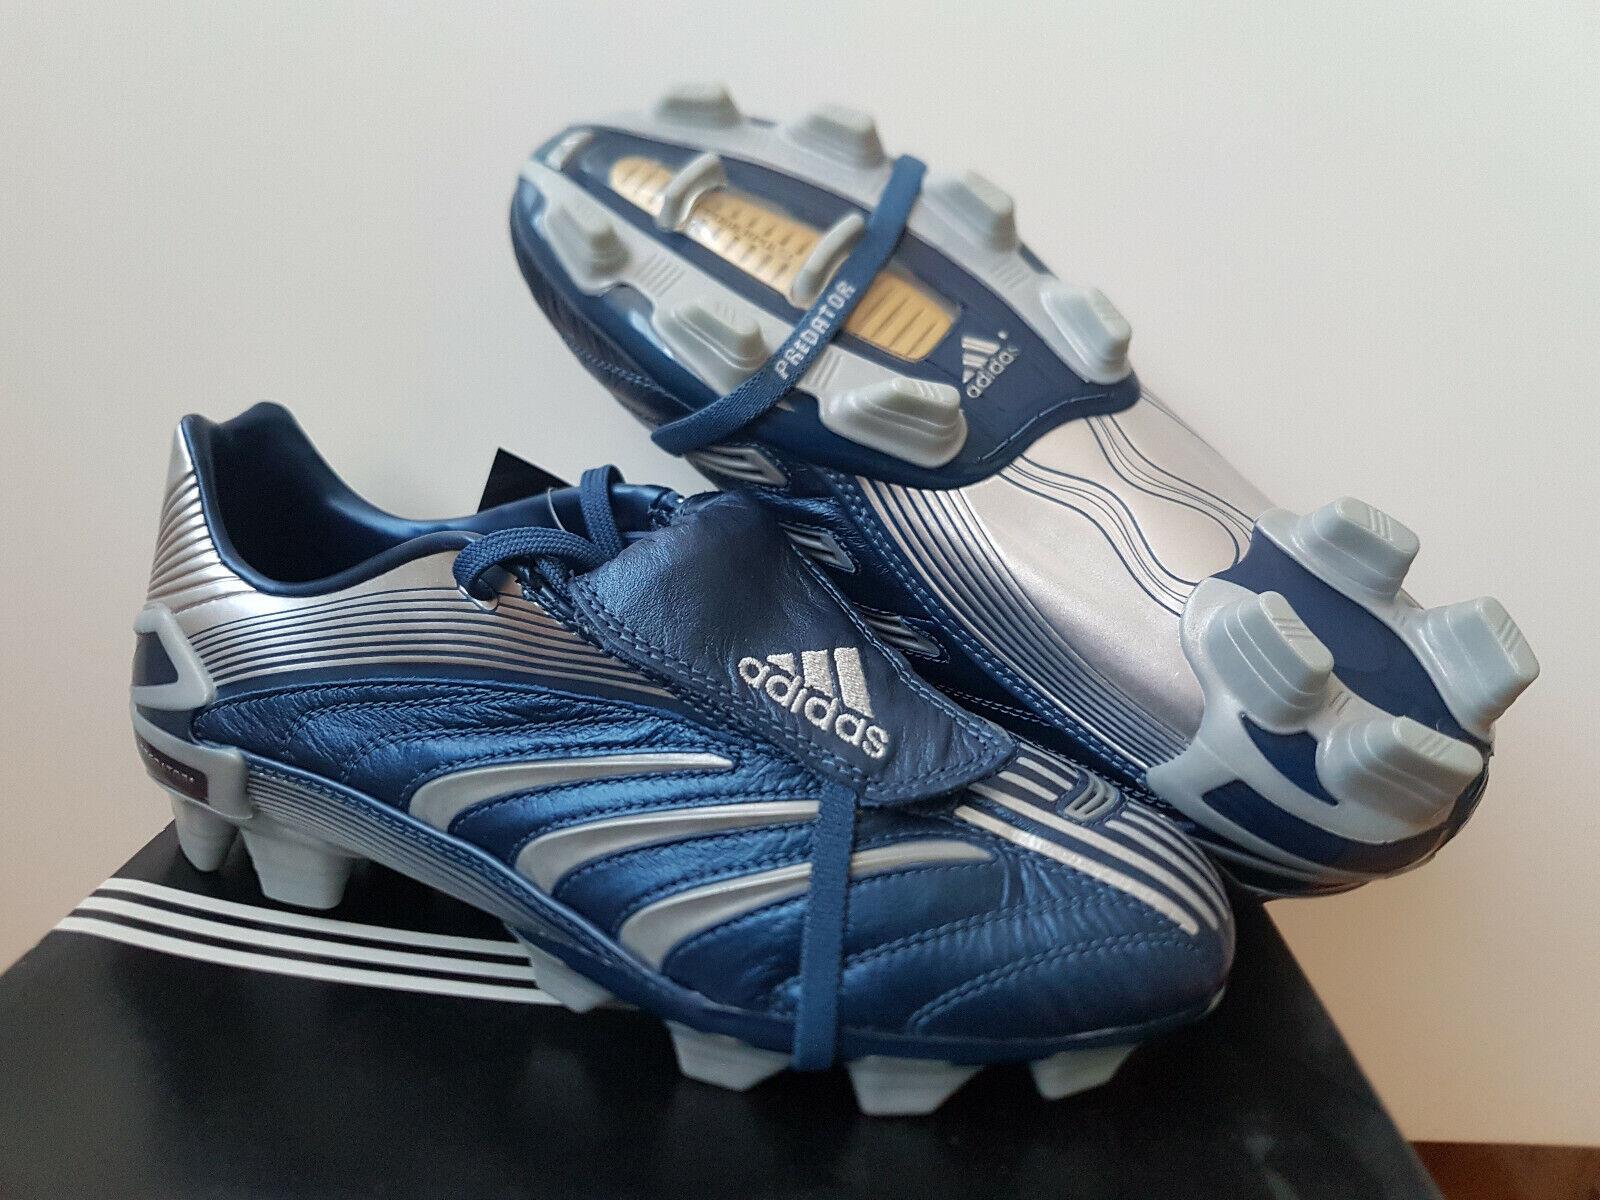 NUOVO Adidas Prossoator Absolute TRX FG UE 41 13 Scarpe Calcio mania Pulse